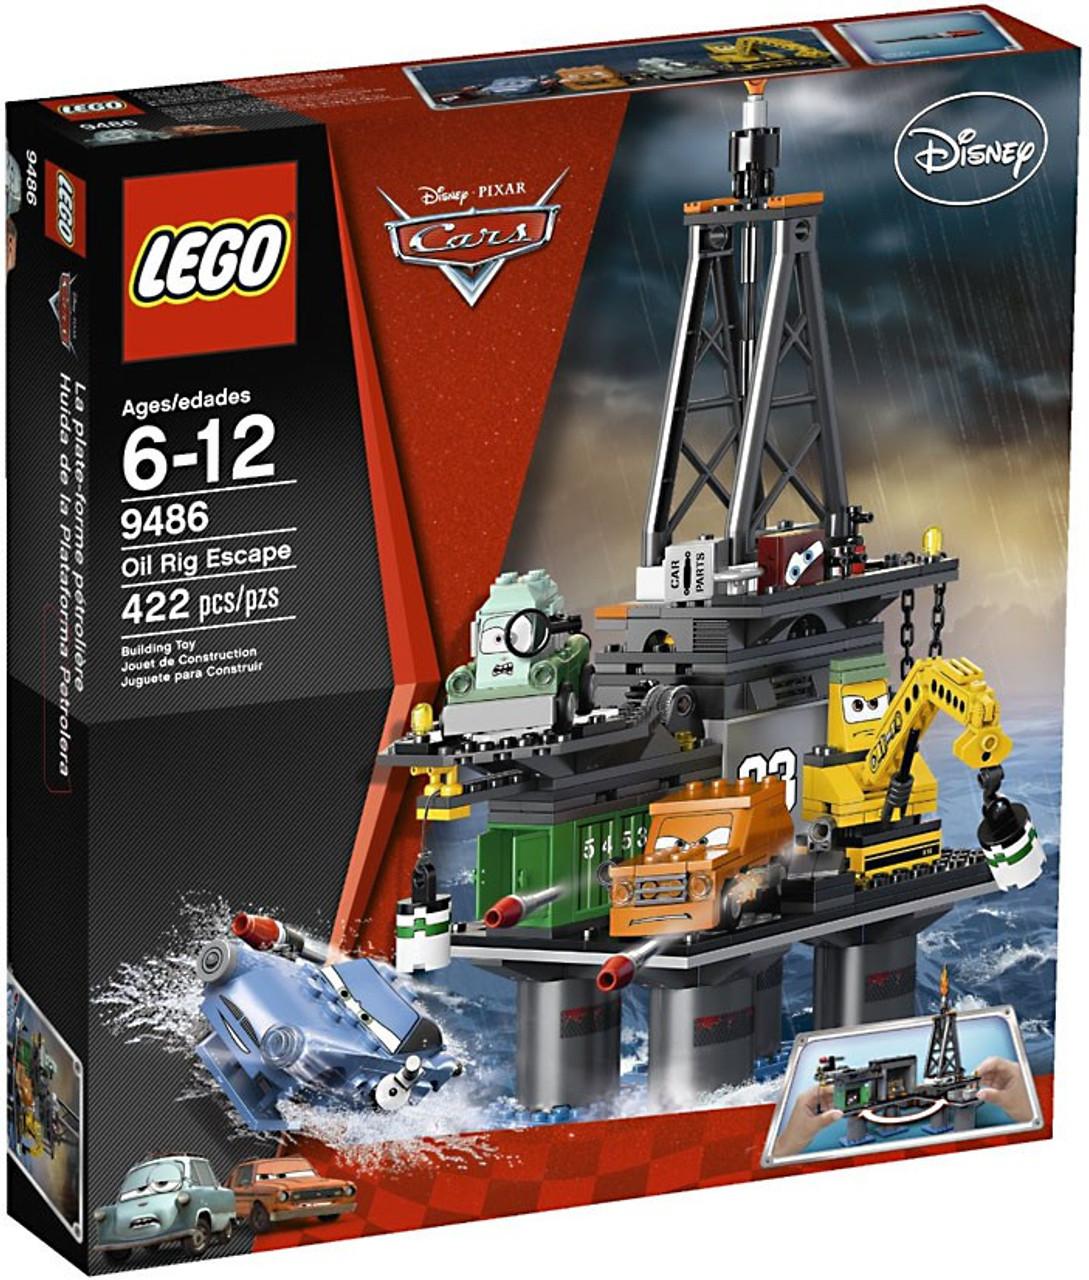 LEGO Disney Cars Oil Rig Escape Set #9486